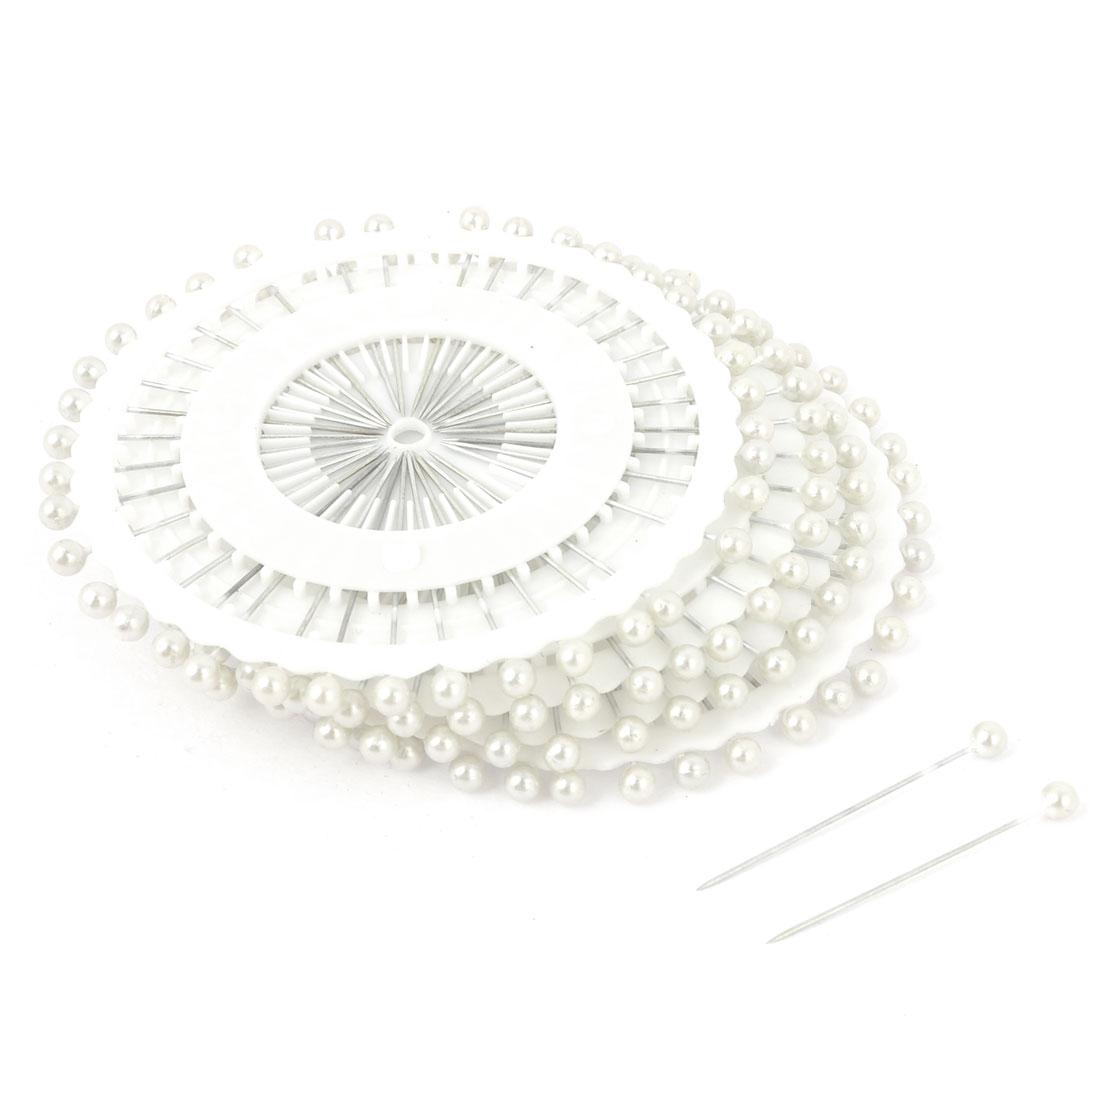 Needlework Tailor White Round Beaded Head Pins 36mm Long 150 PCS